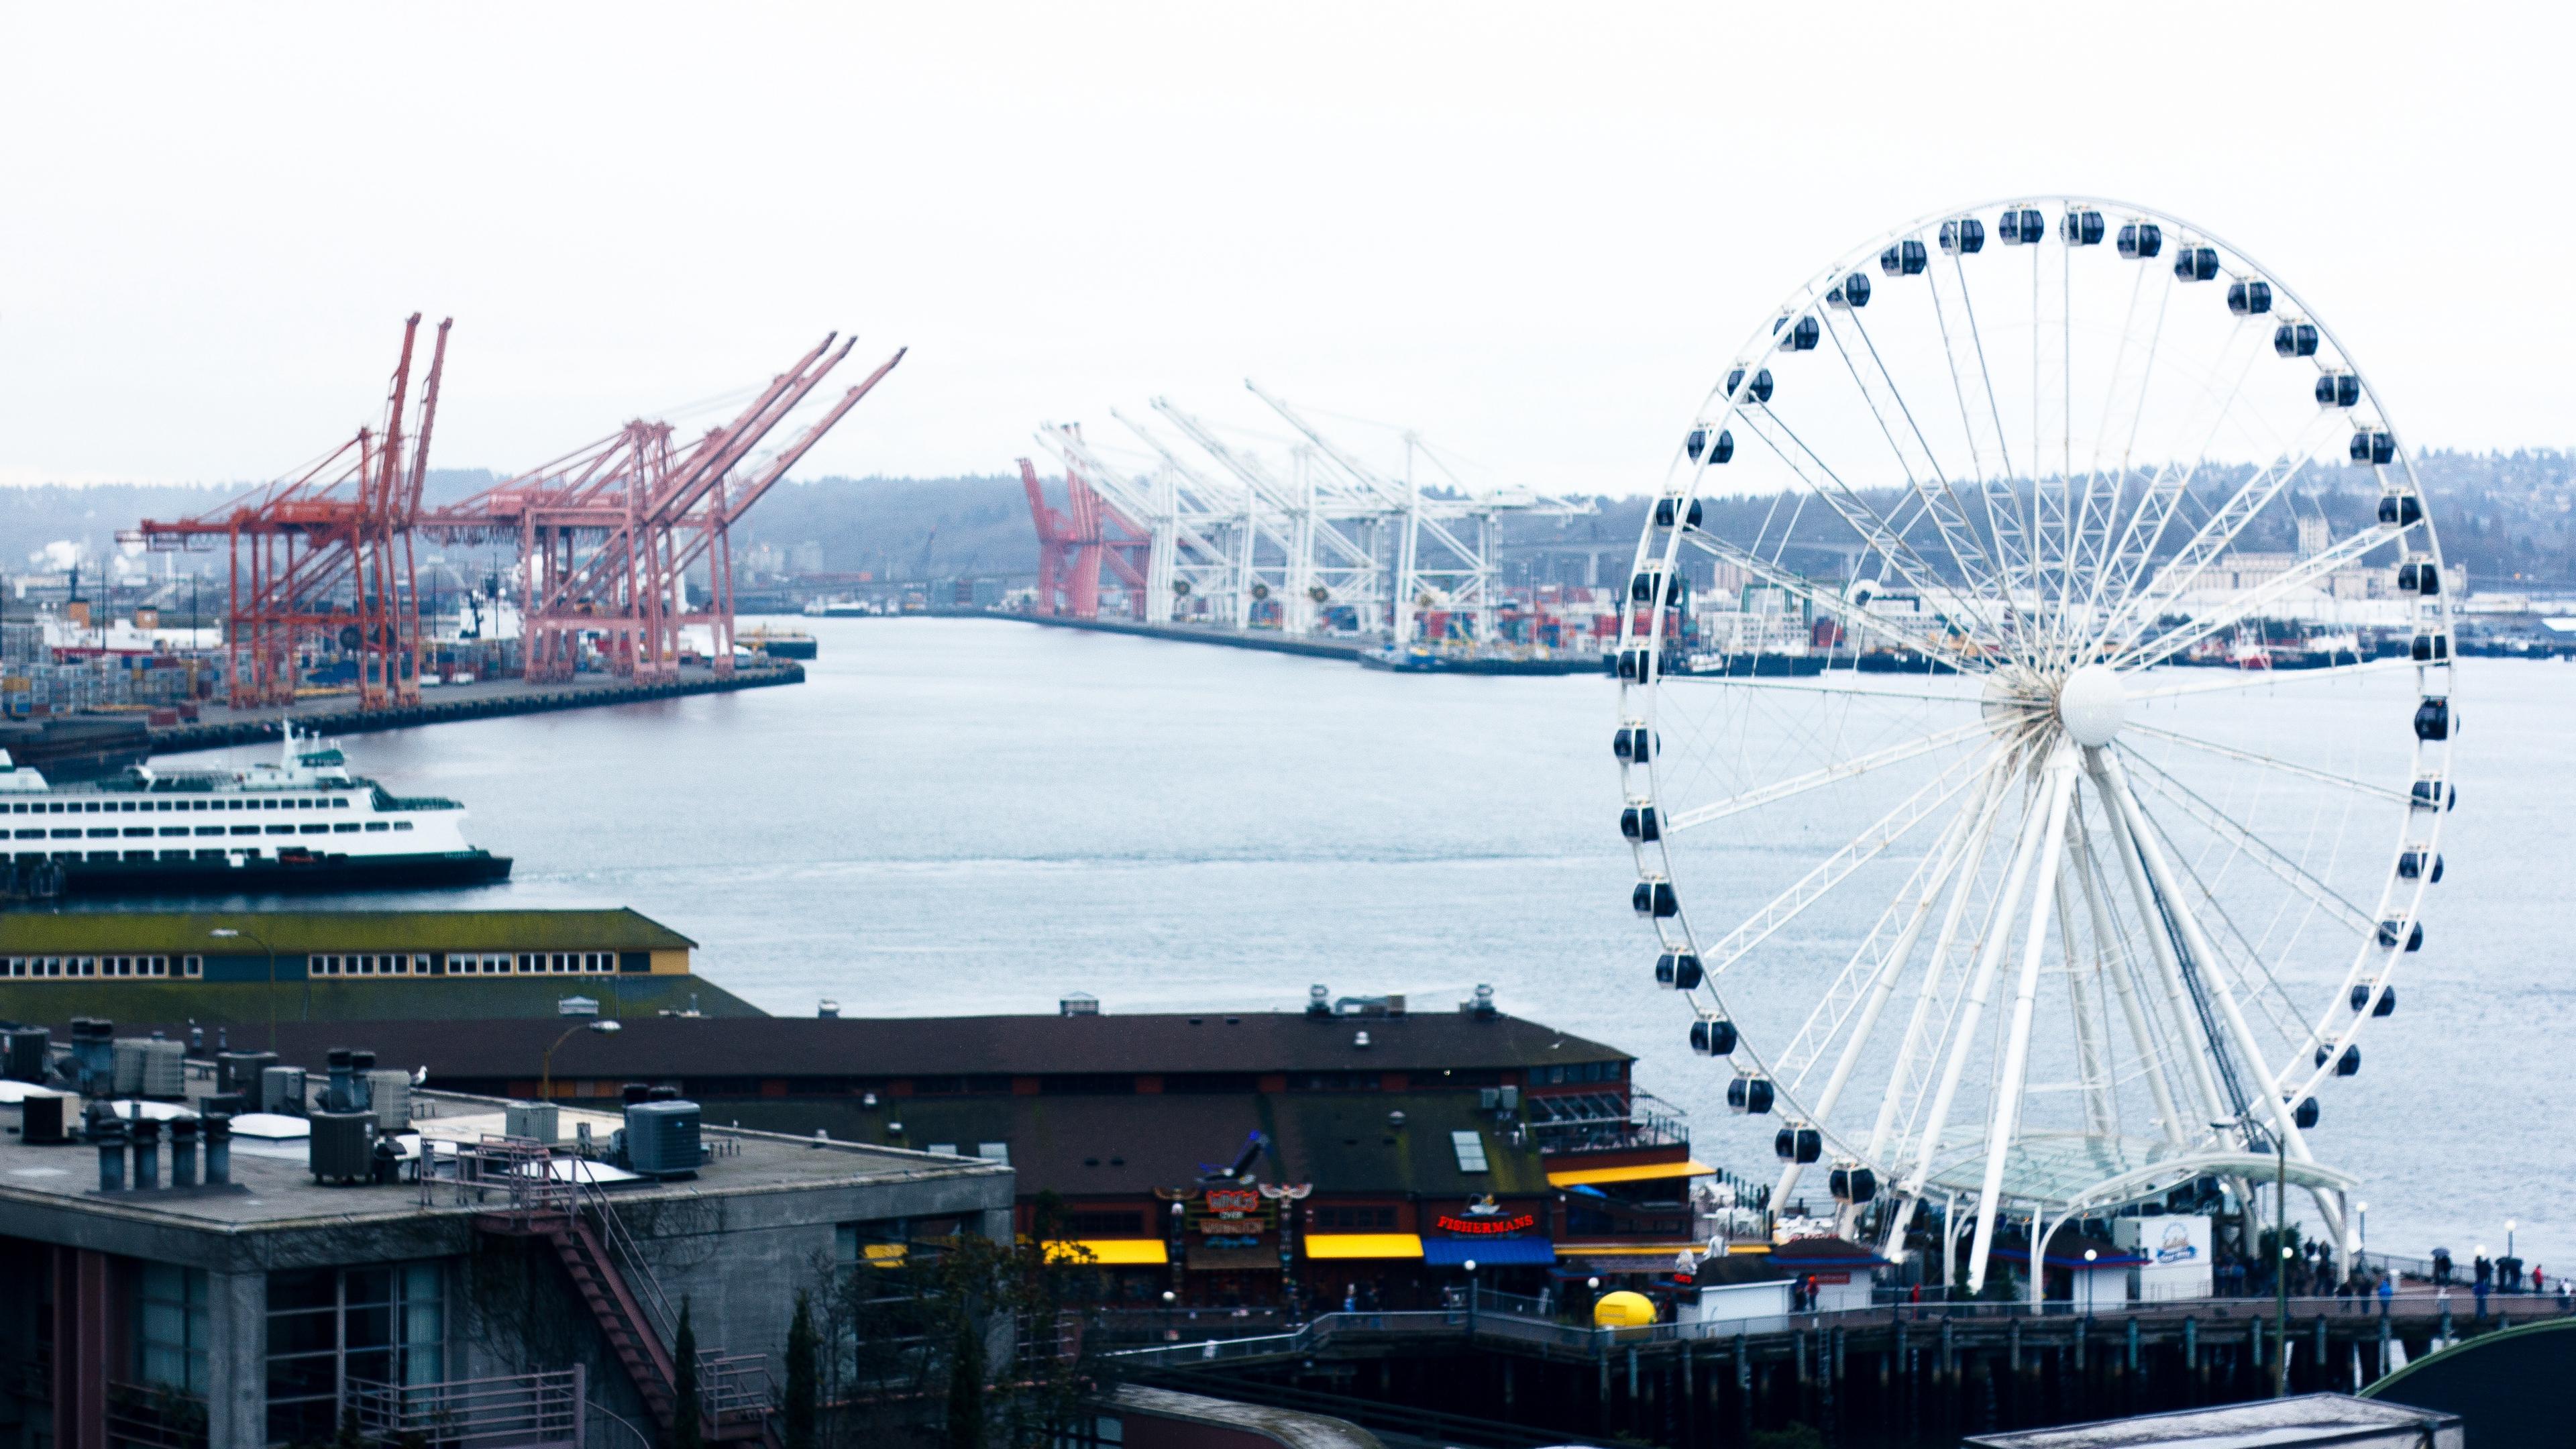 ferris wheel port sea 4k 1538066181 - ferris wheel, port, sea 4k - Sea, port, ferris wheel